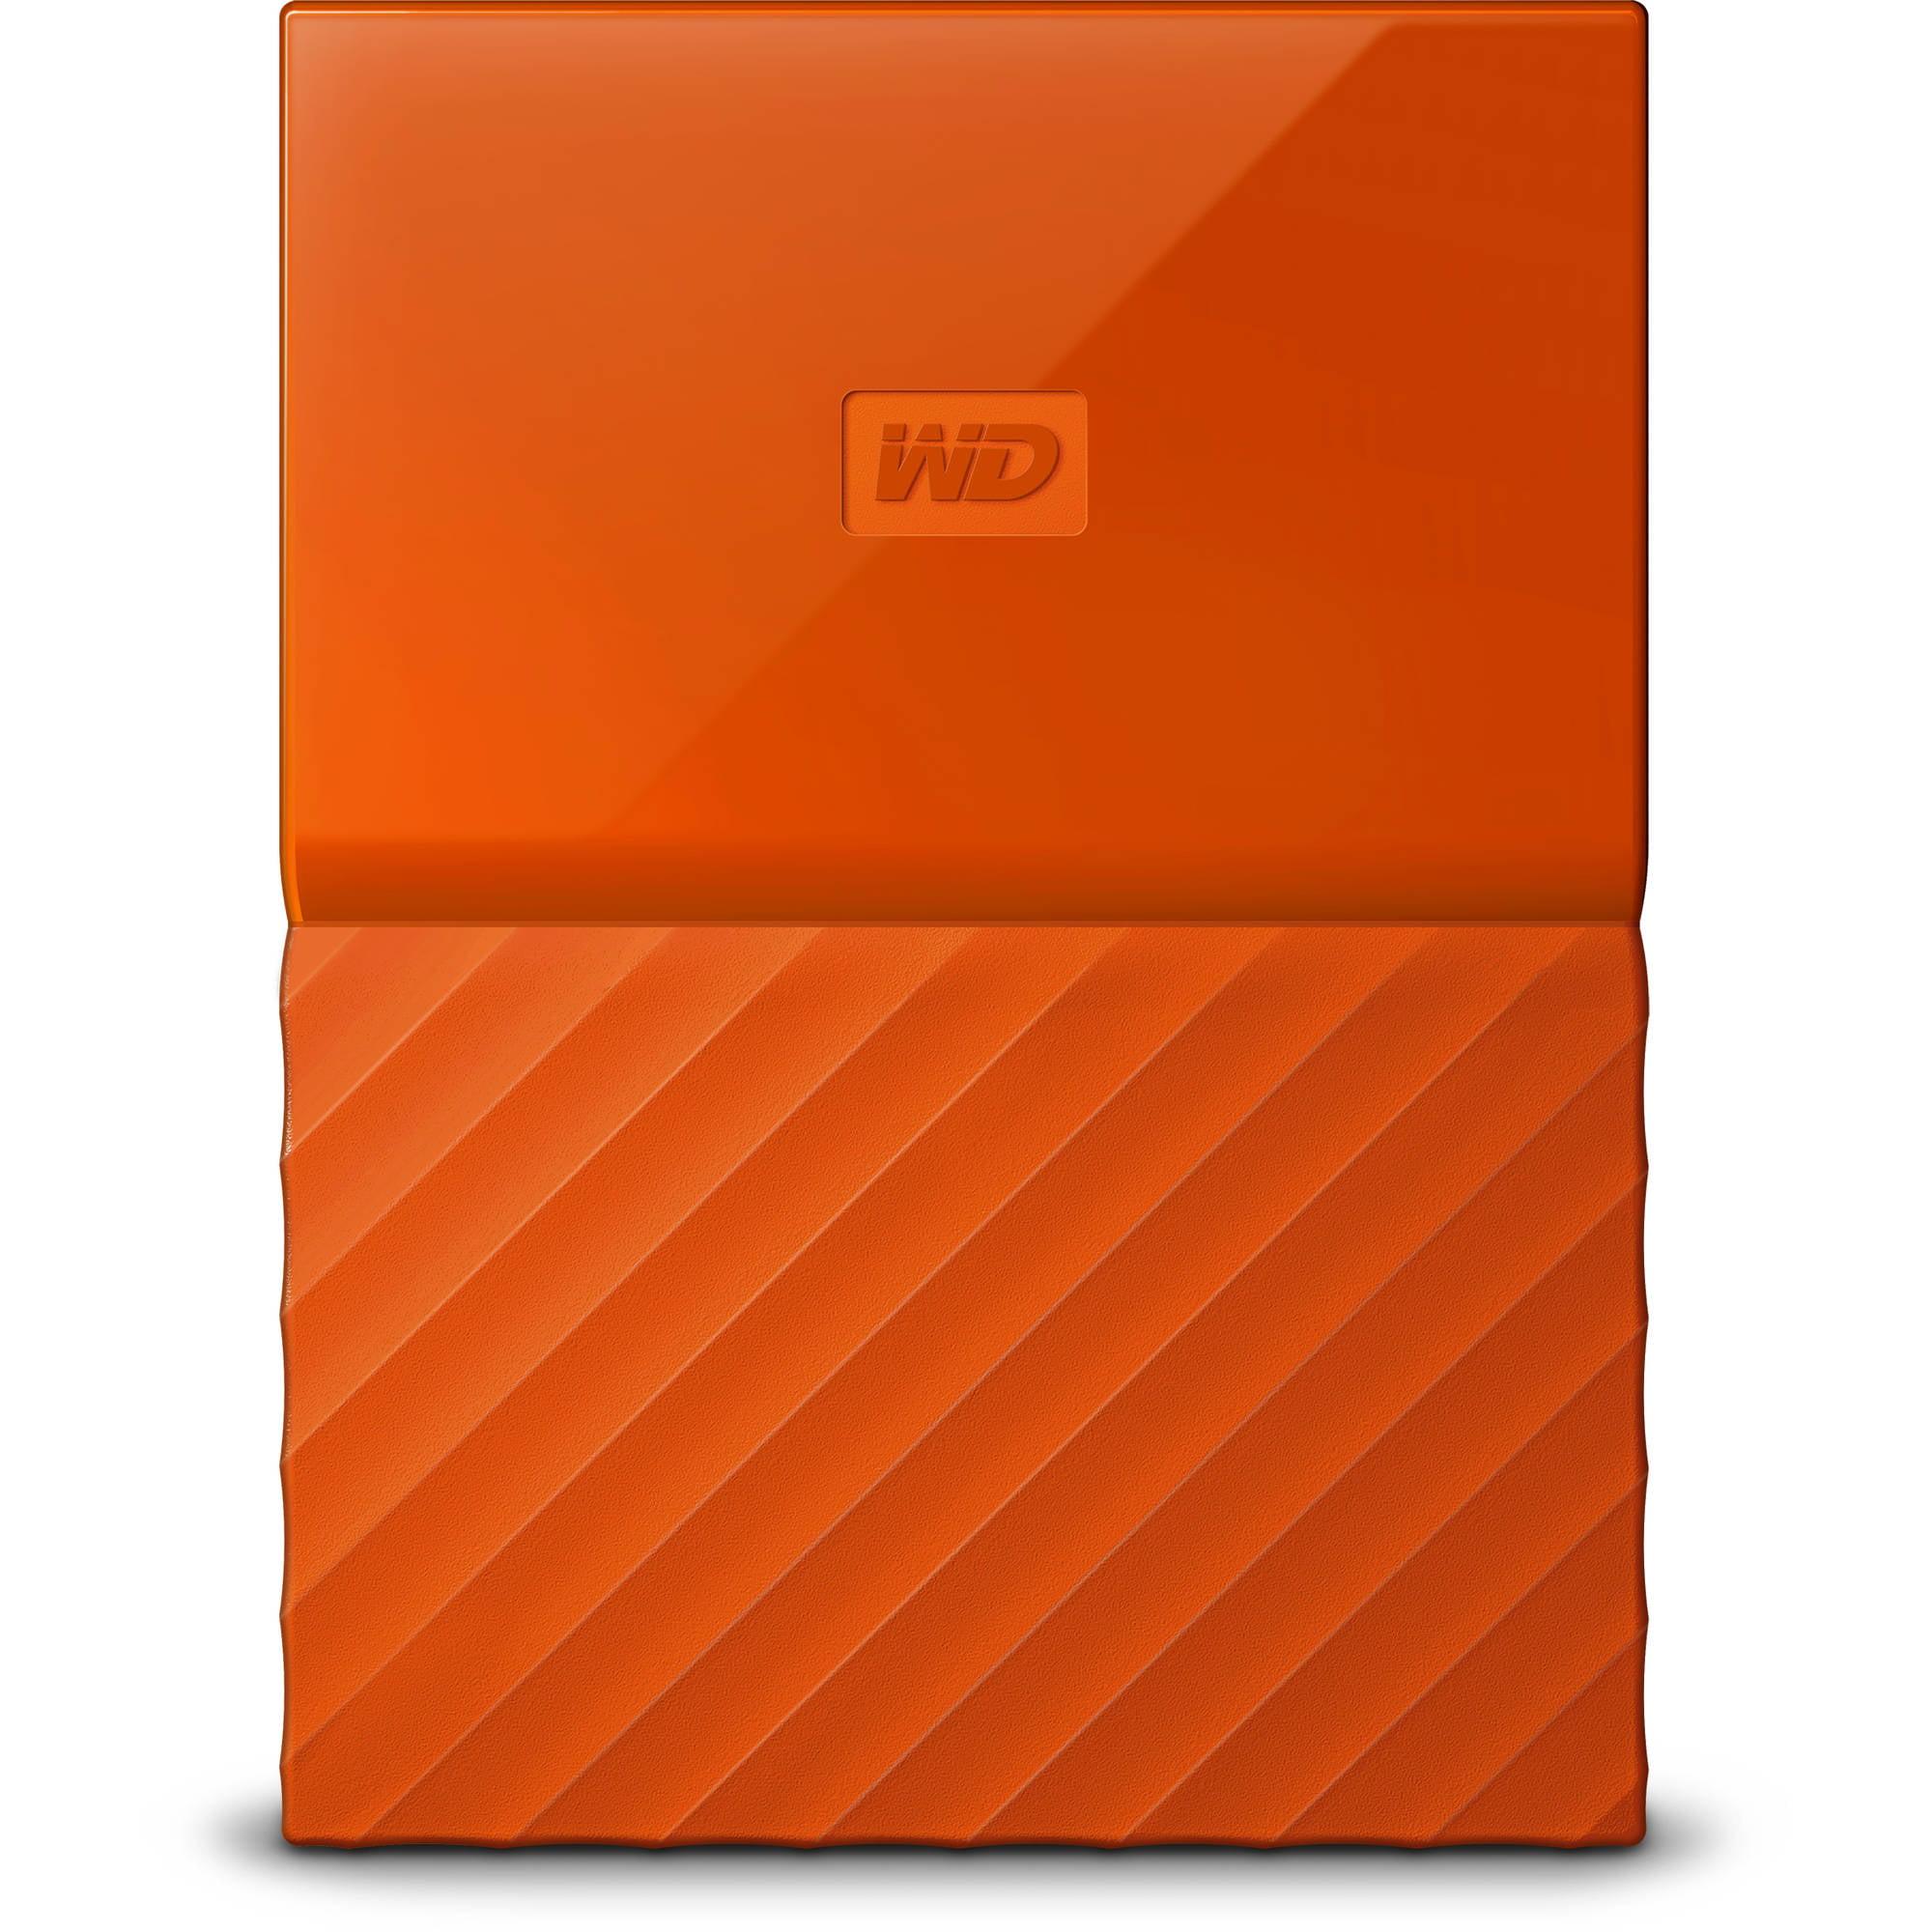 Western Digital My Passport 4TB Portable External Hard Drive, Orange by Western Digital